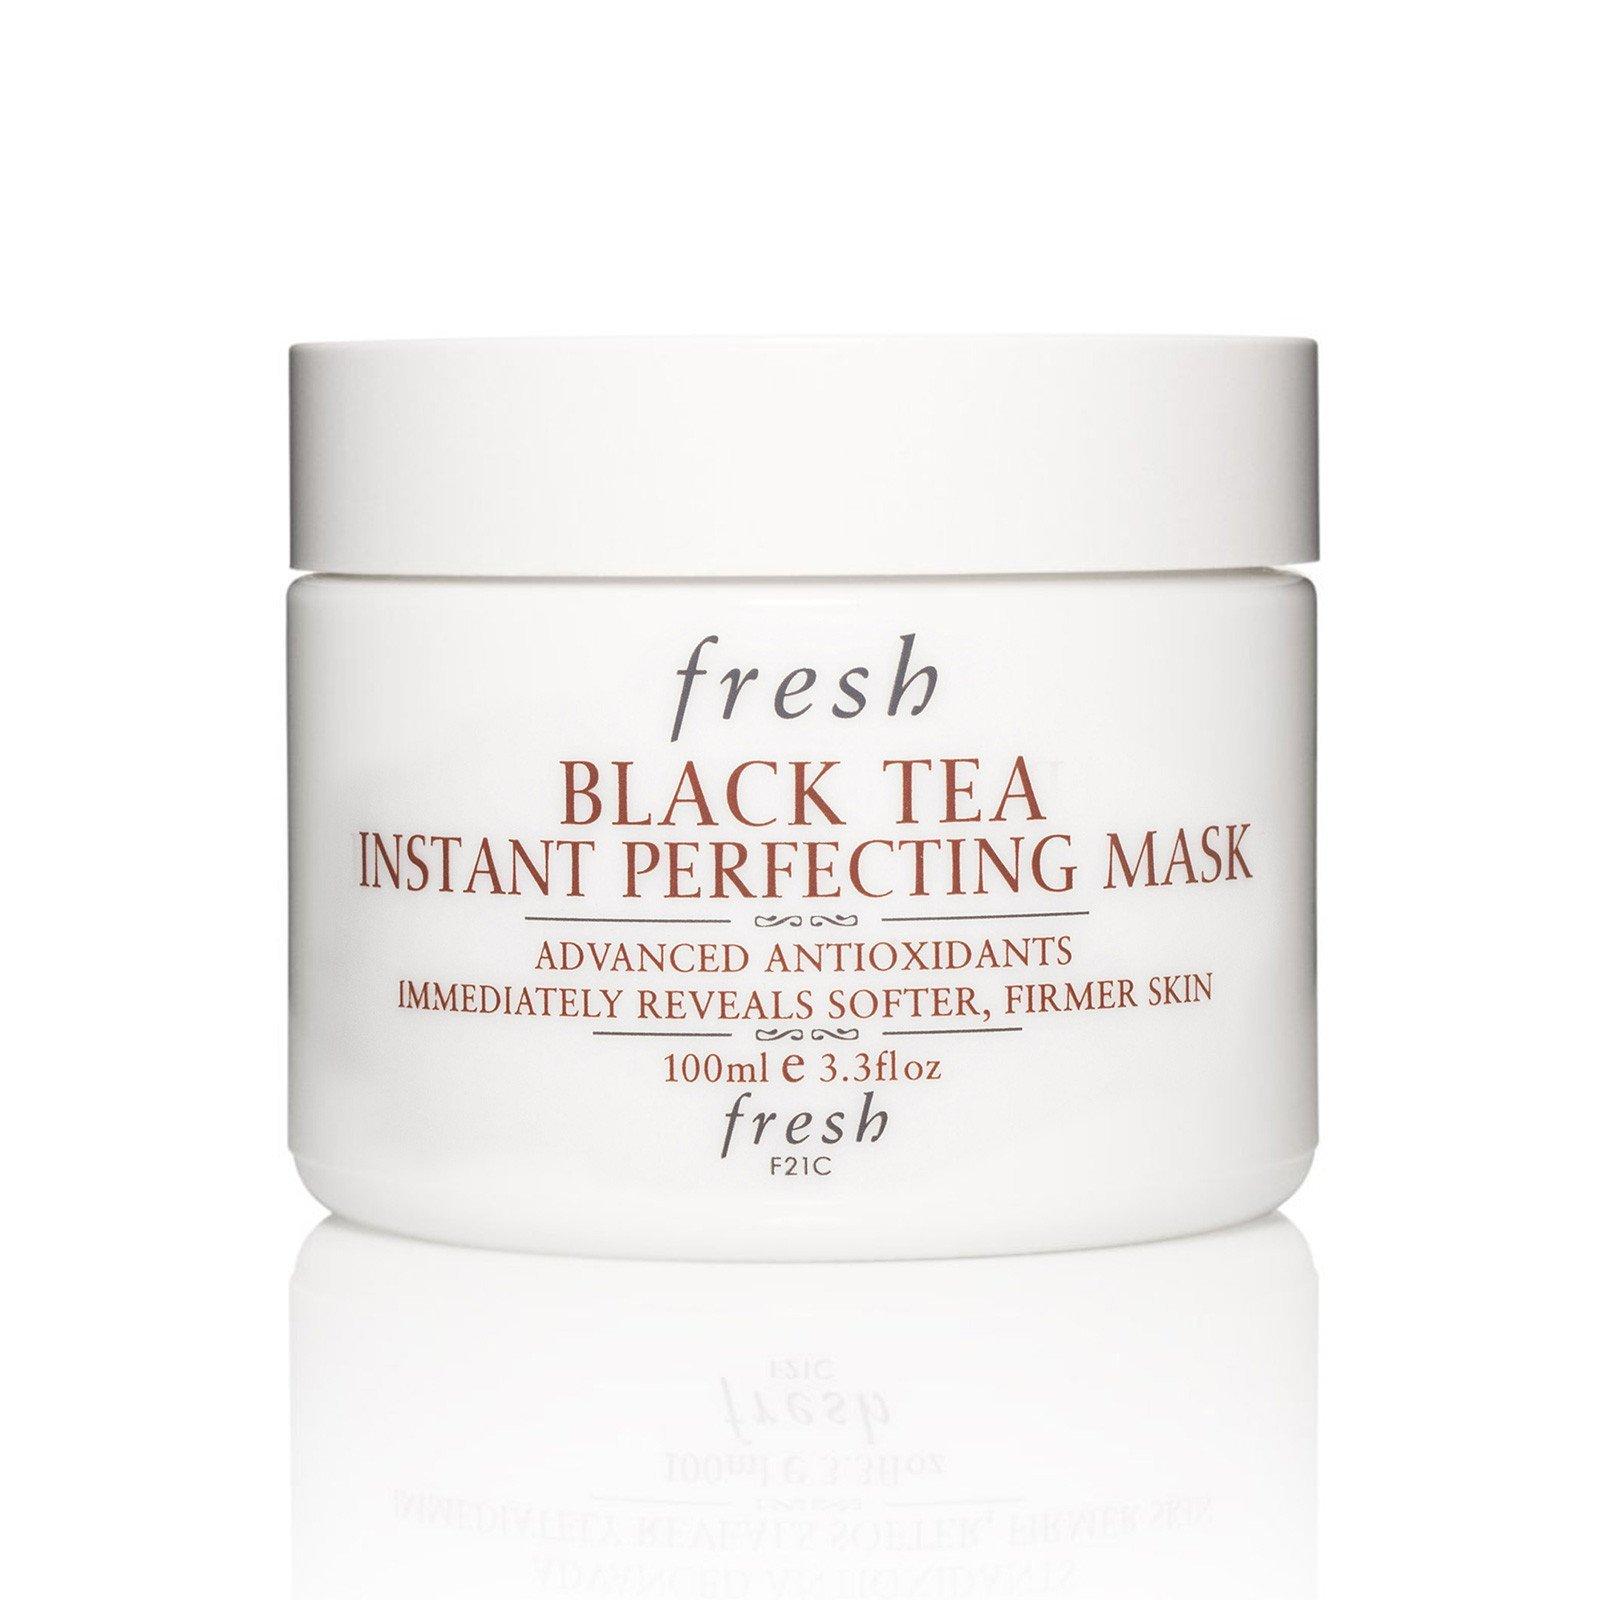 Fresh Black Tea Instant Perfecting Mask 100ml - $111.99